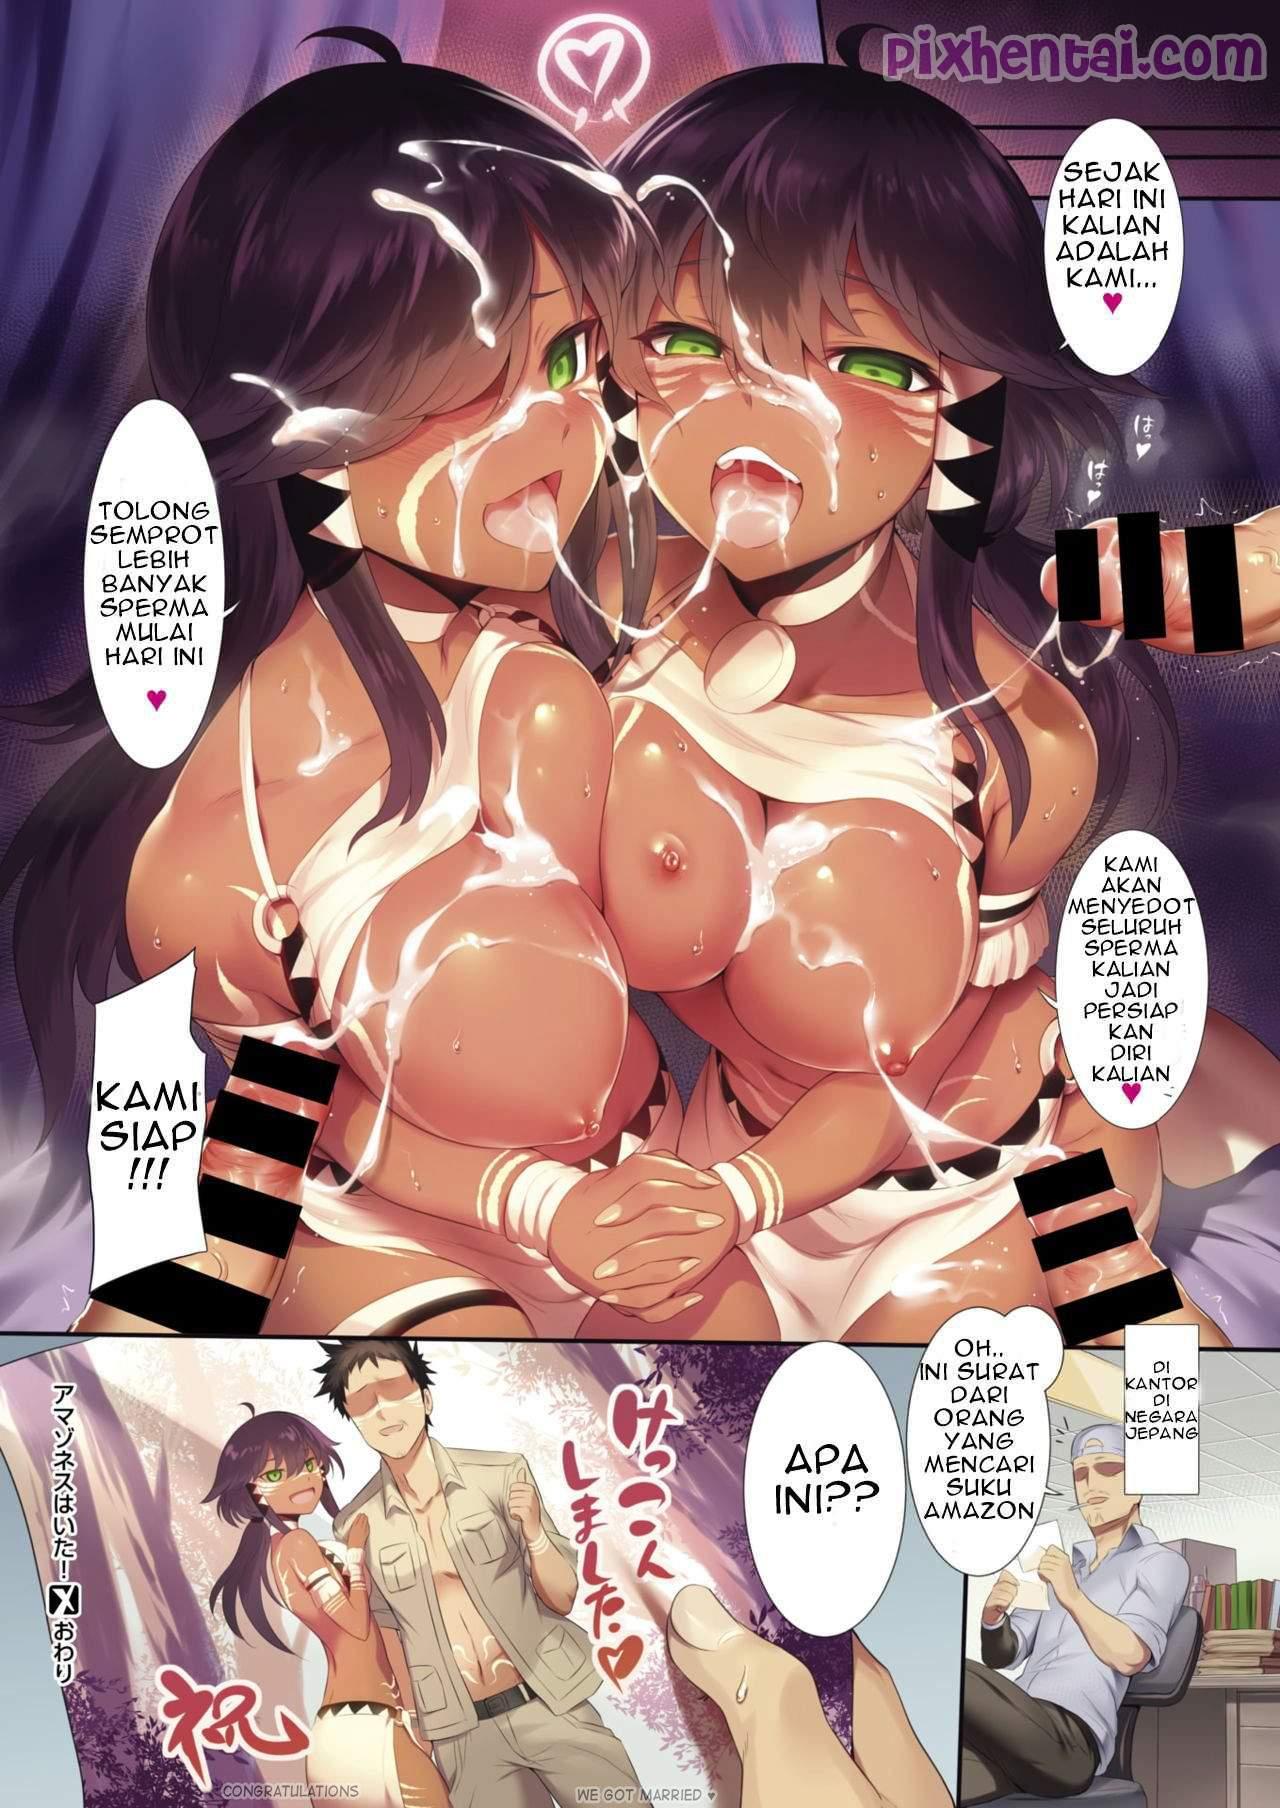 Komik hentai xxx manga sex bokep entot wanita suku amazon 08